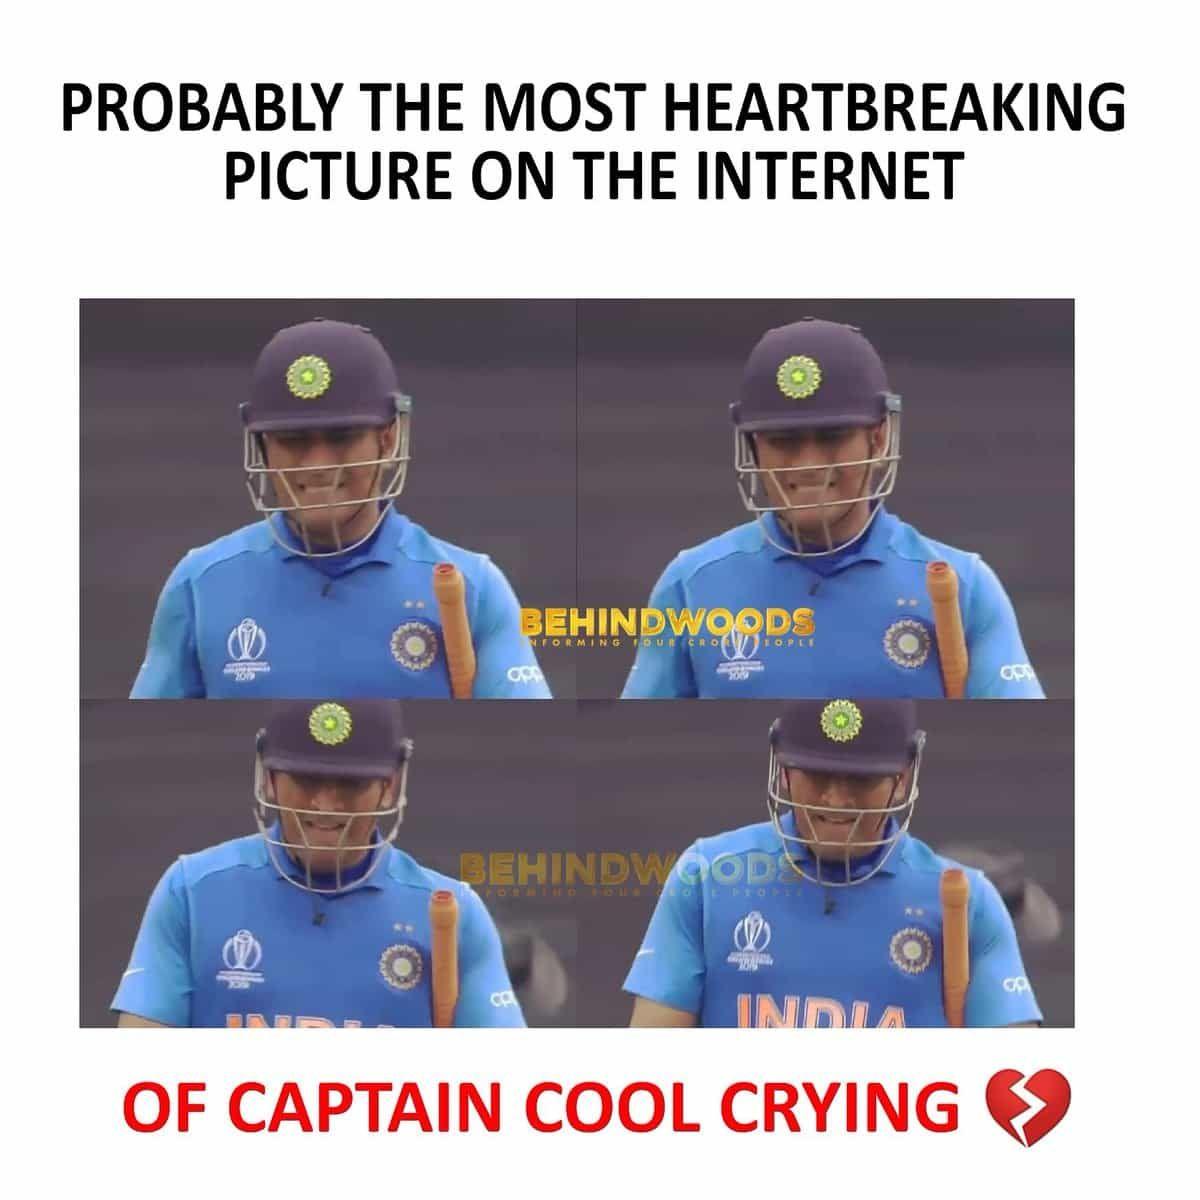 Cricket World Cup Funny Memes 2019 Brians Ocean Ms Dhoni Wallpapers Dhoni Wallpapers Dhoni Quotes